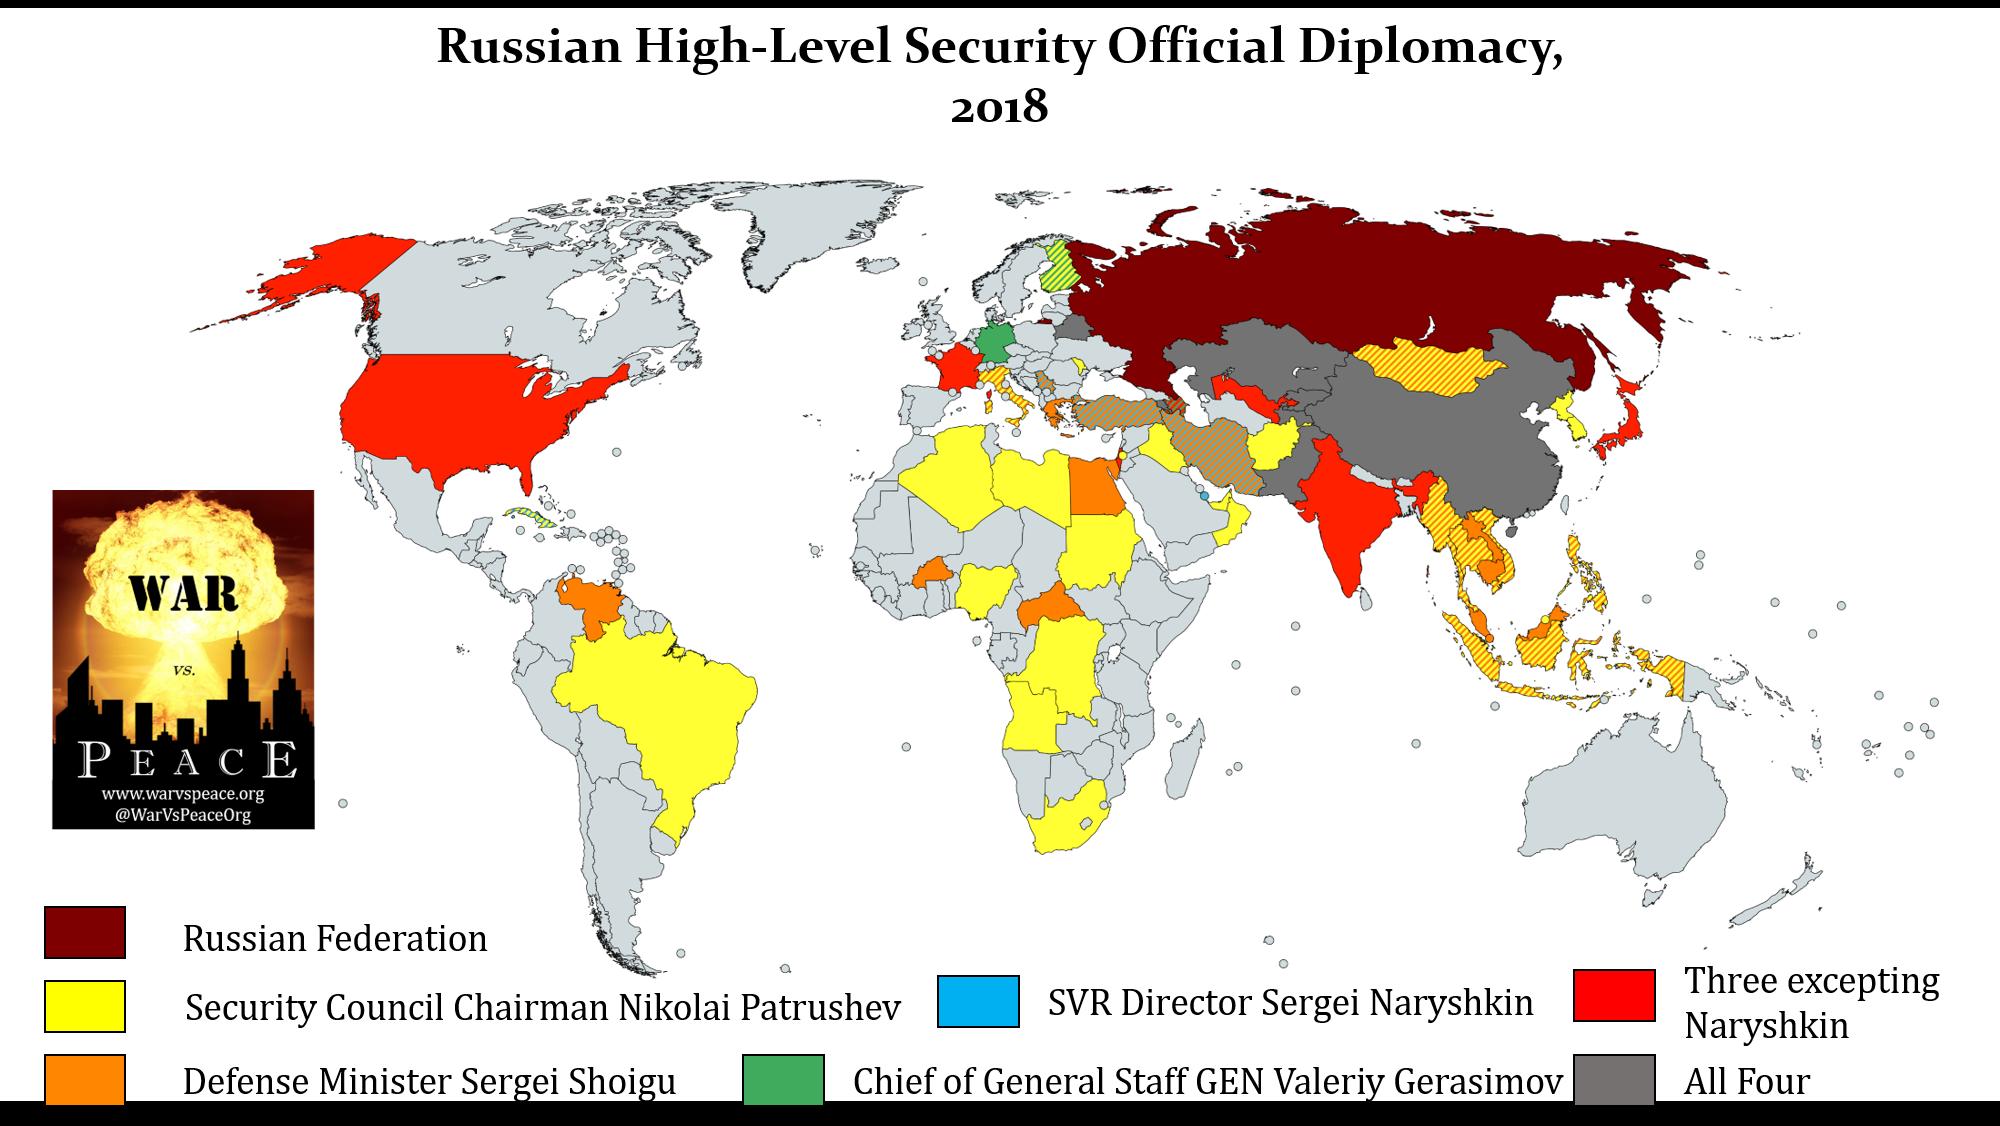 2018 RUS Security Diplomacy.png